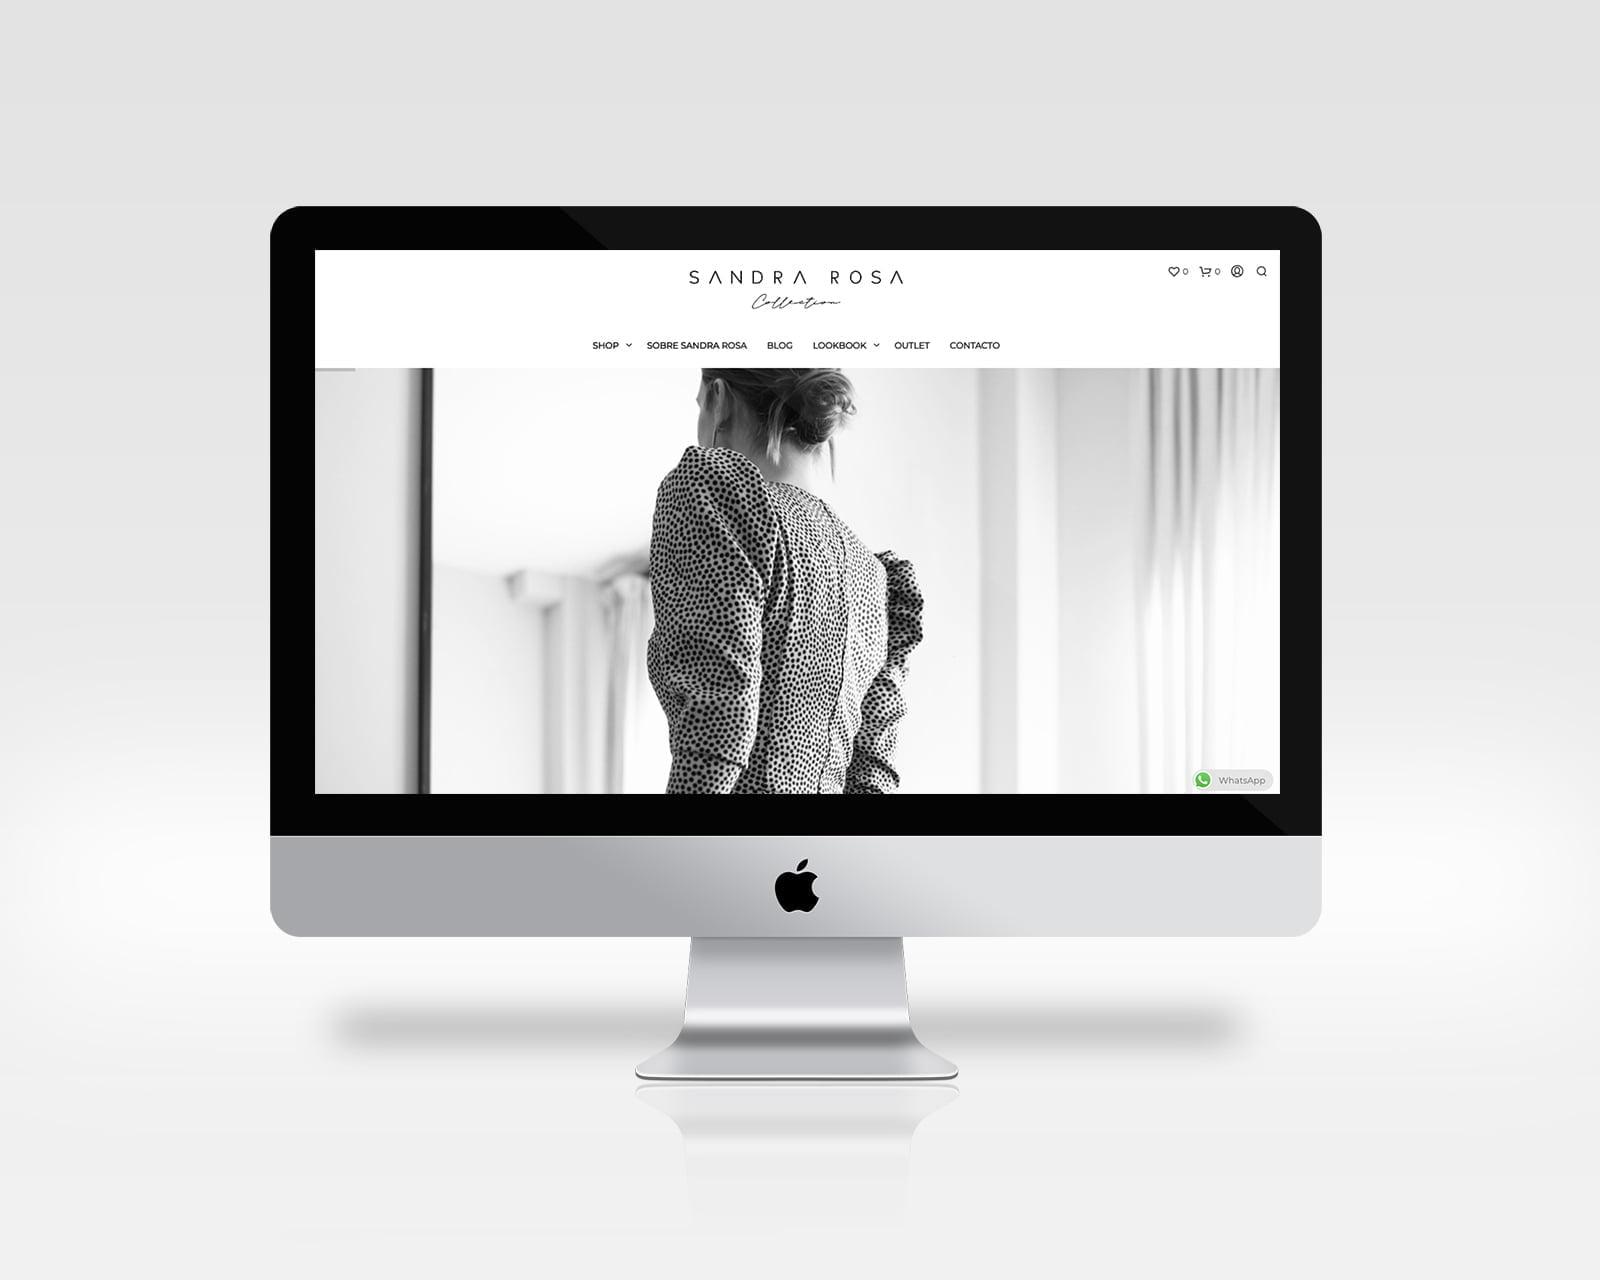 sandrarosa portada diseño web cantabria